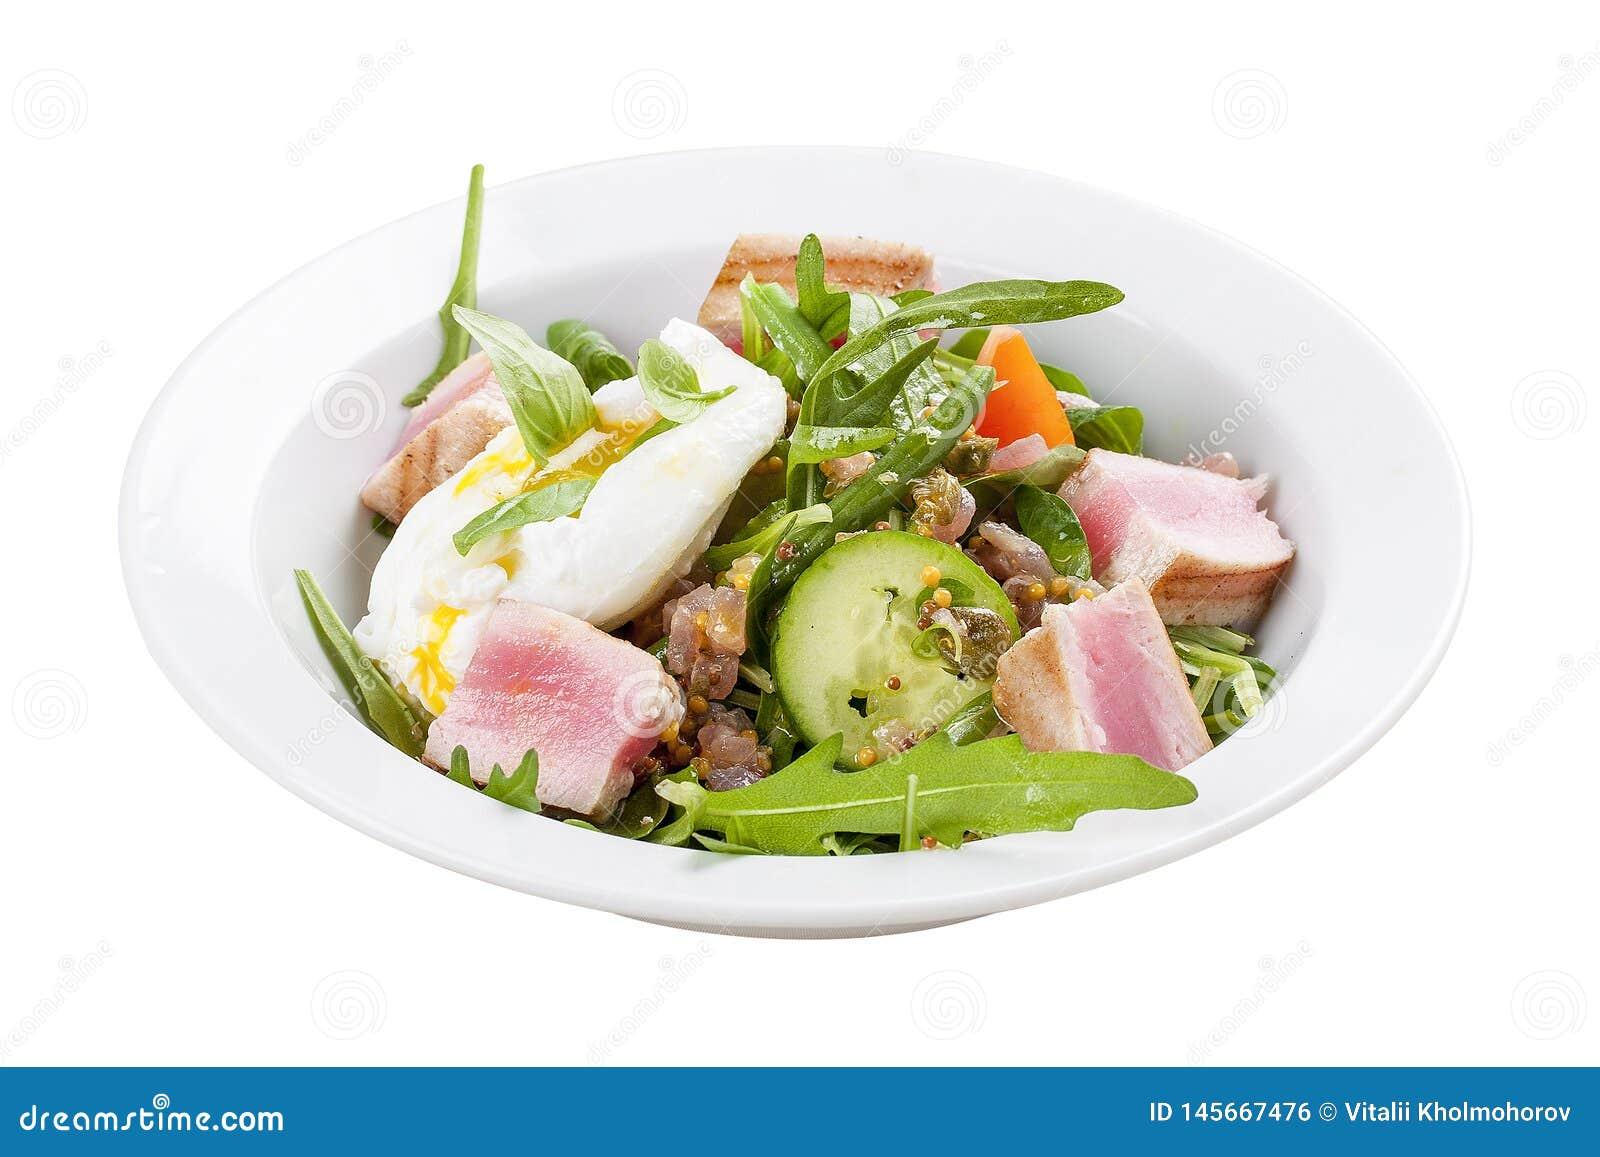 'A salada de Nicoise